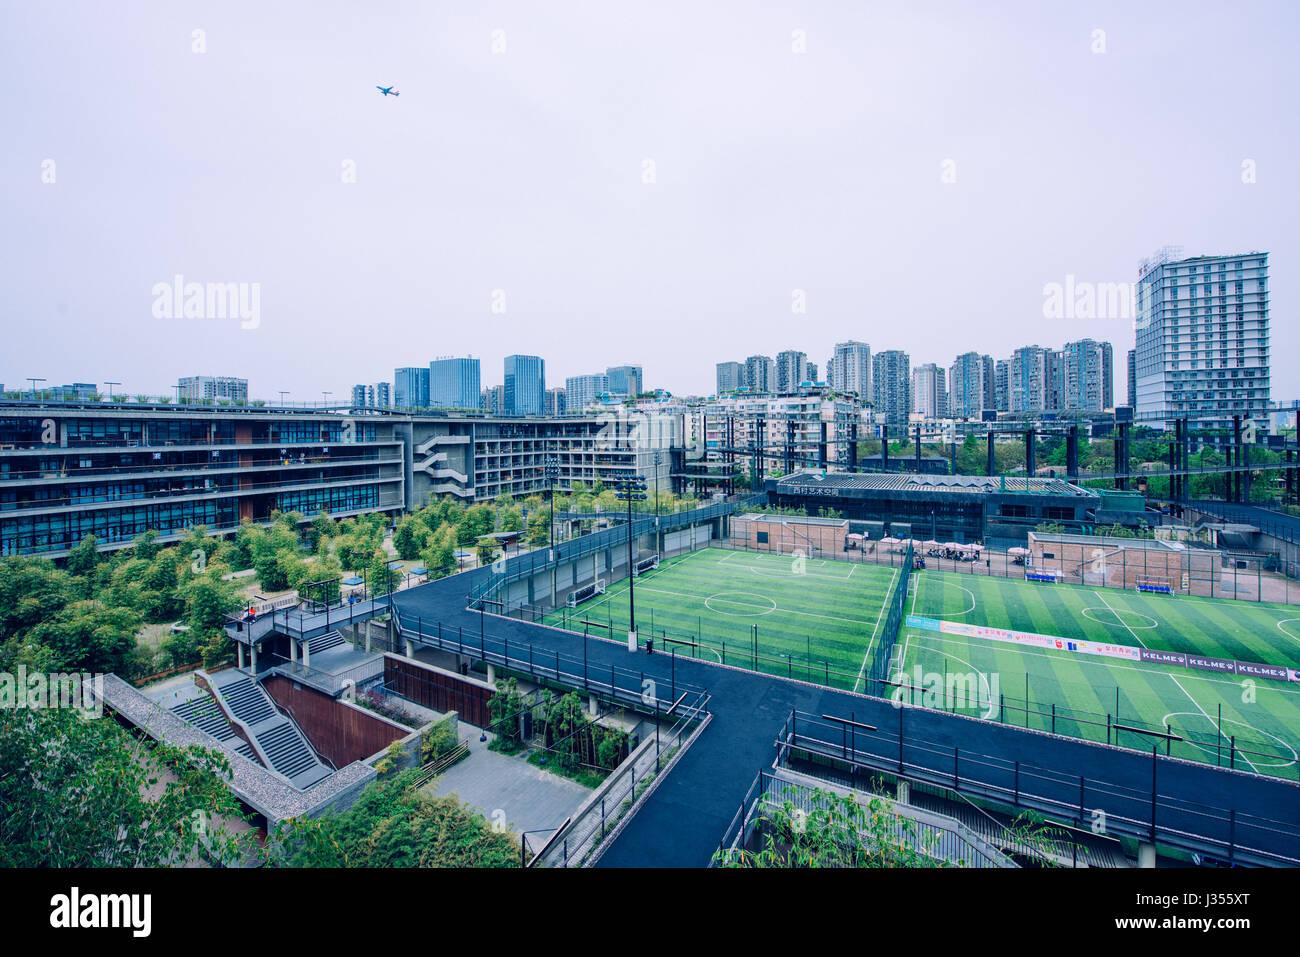 West village community the retrofit project chengdu for Sichuan cendes architectural design company limited